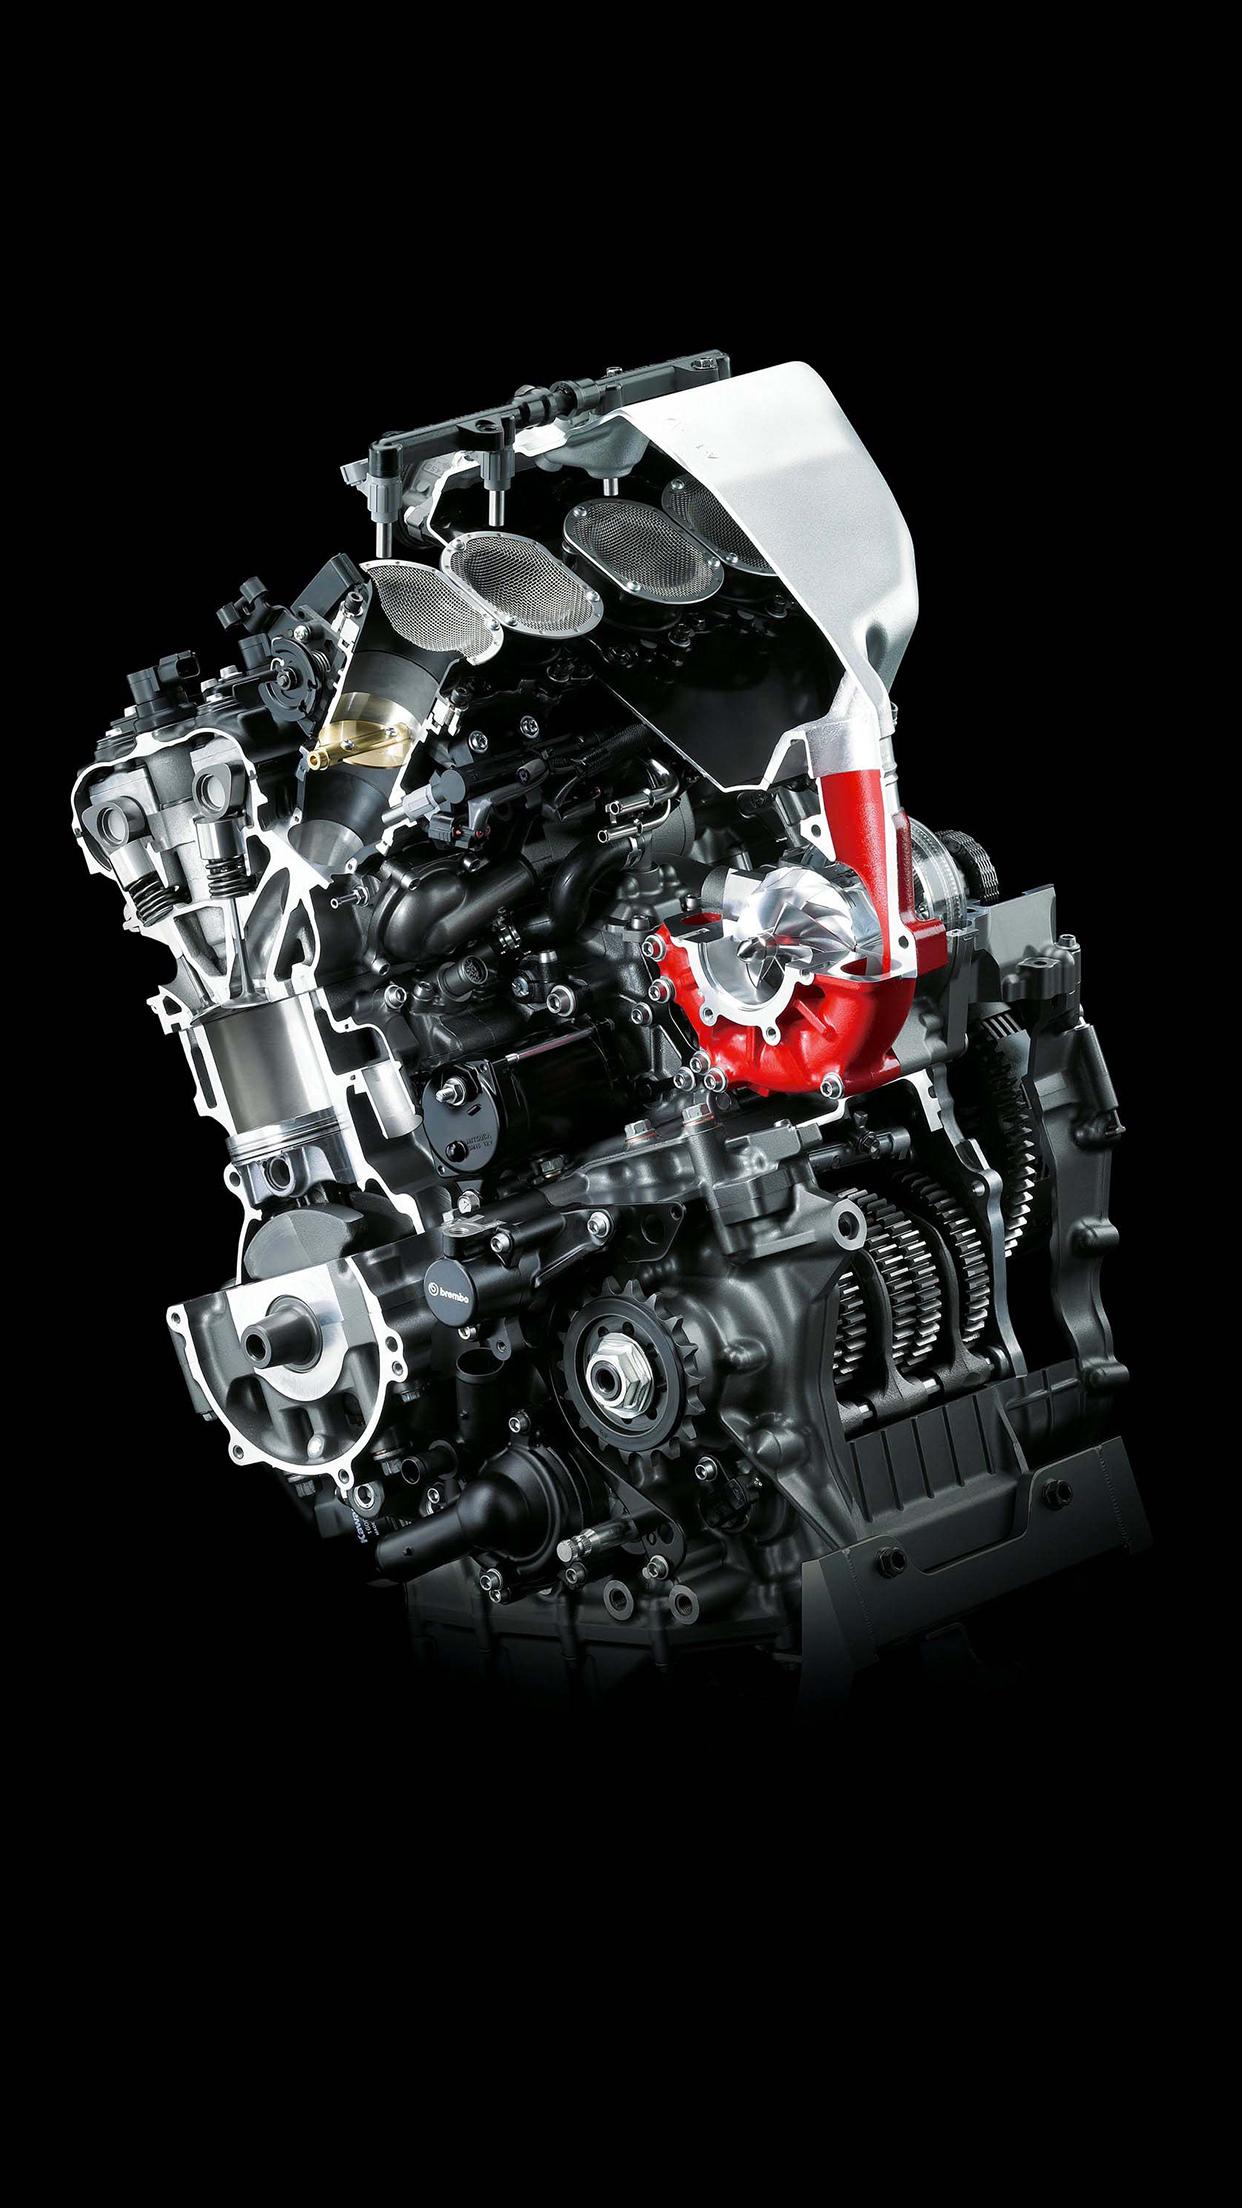 Kawasaki H2R engine iPhone Parallax 3Wallpapers Kawasaki H2R Engine